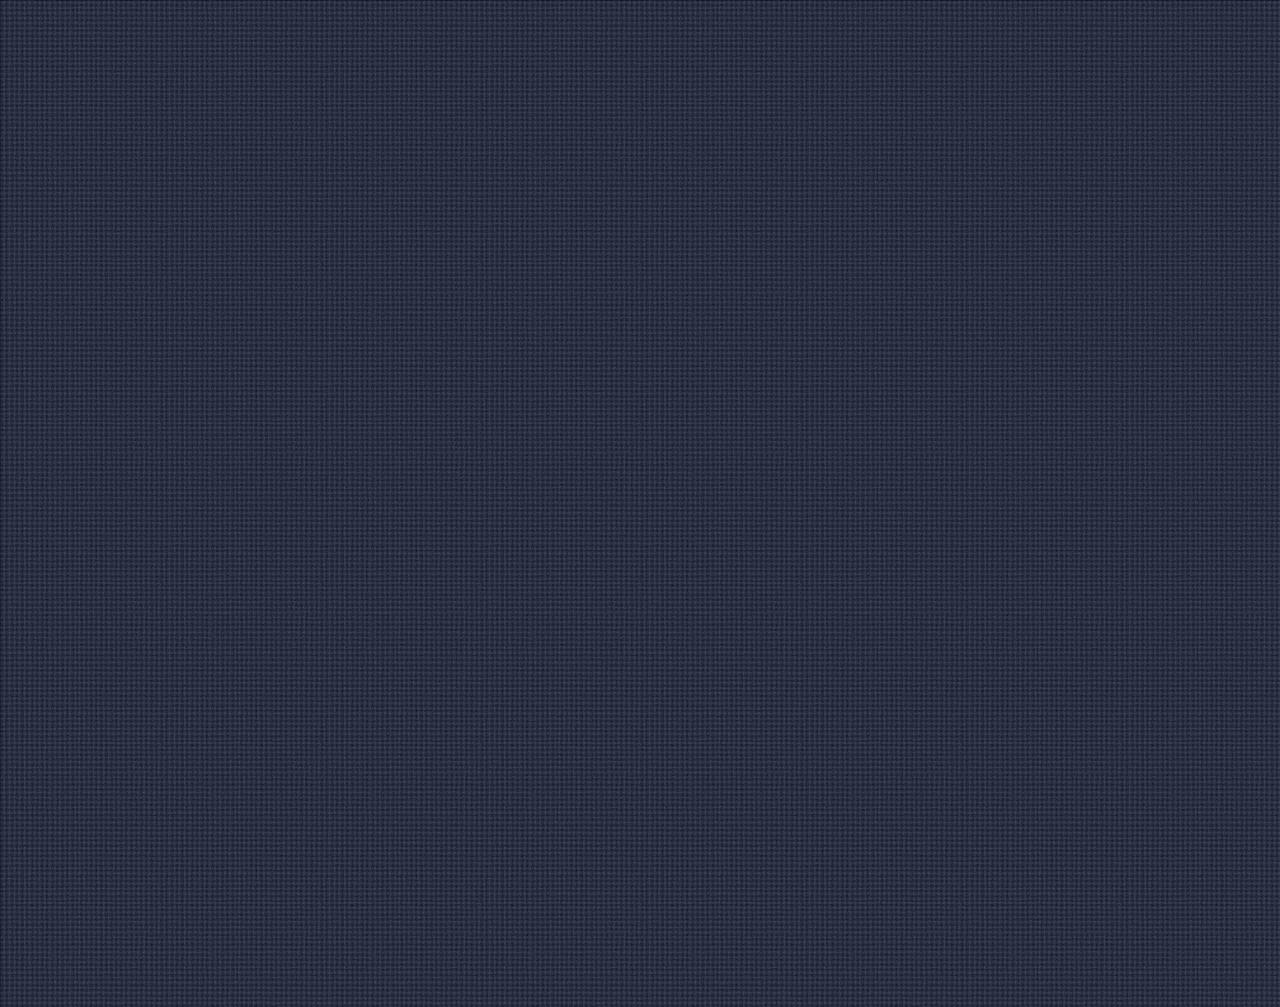 Navy Blue Textured Background Seamless 1280x1007